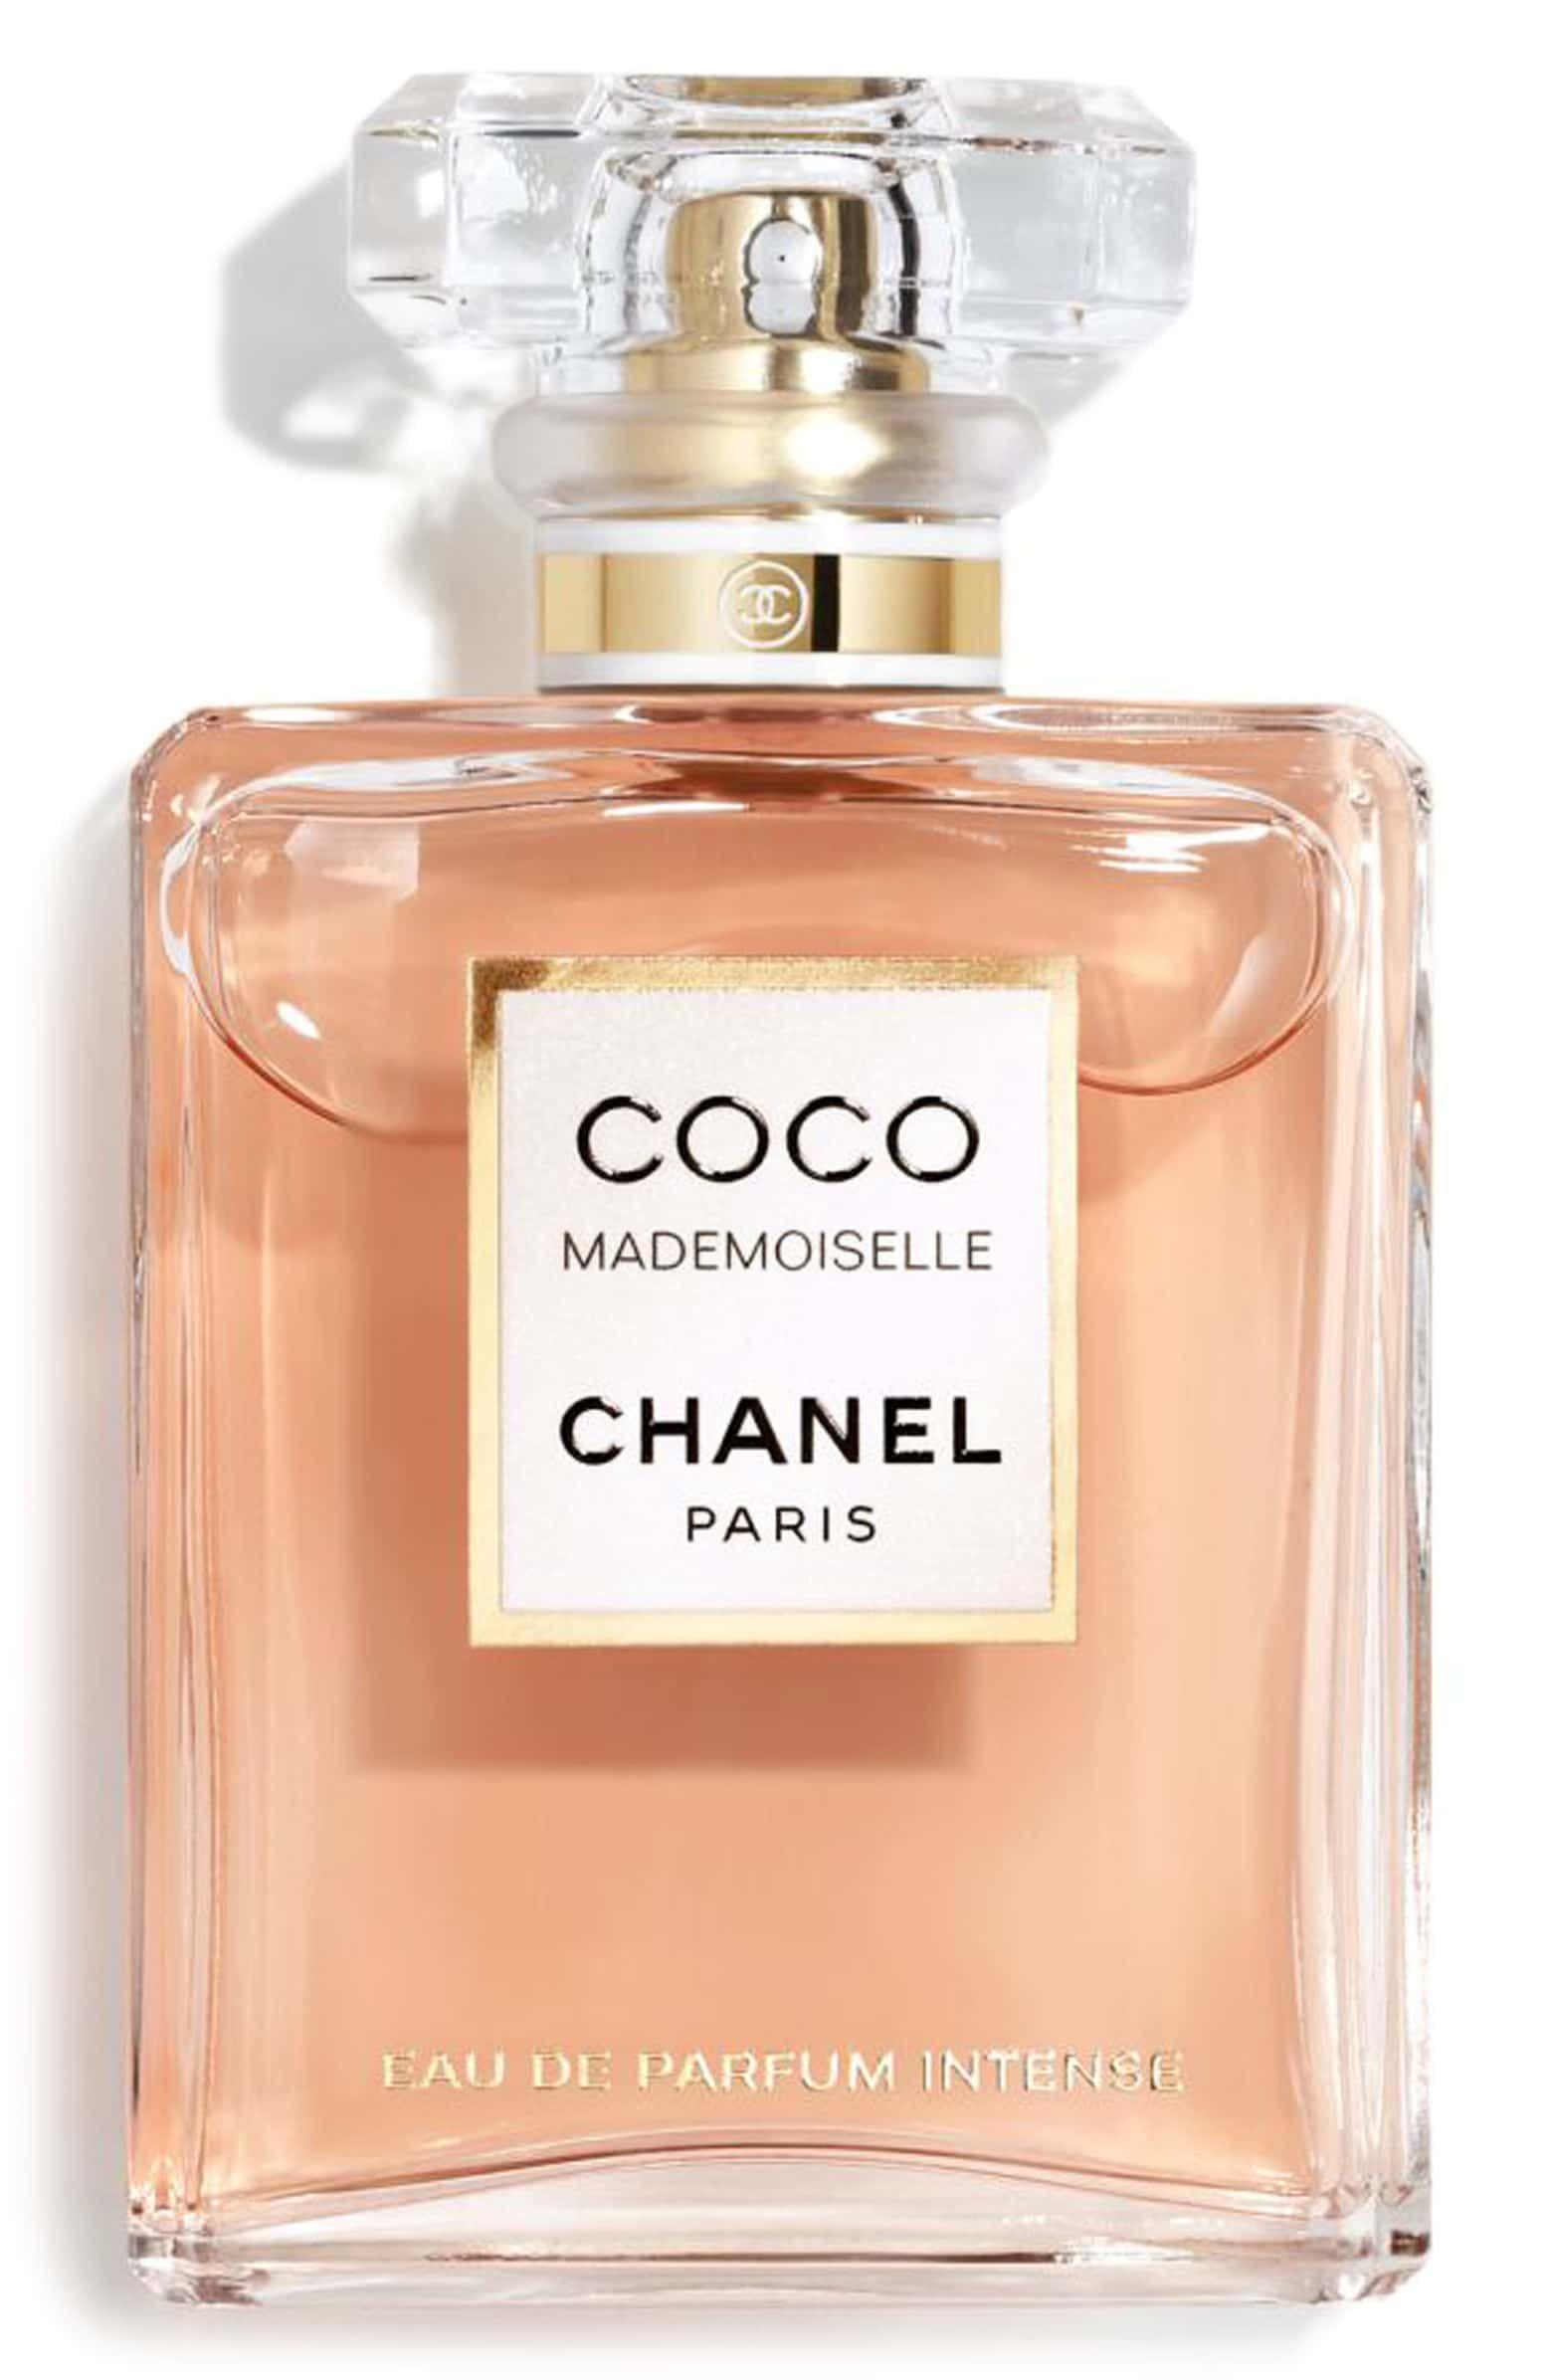 acbe9fbf COCO MADEMOISELLE Eau de Parfum Intense | my perfumes in 2019 ...